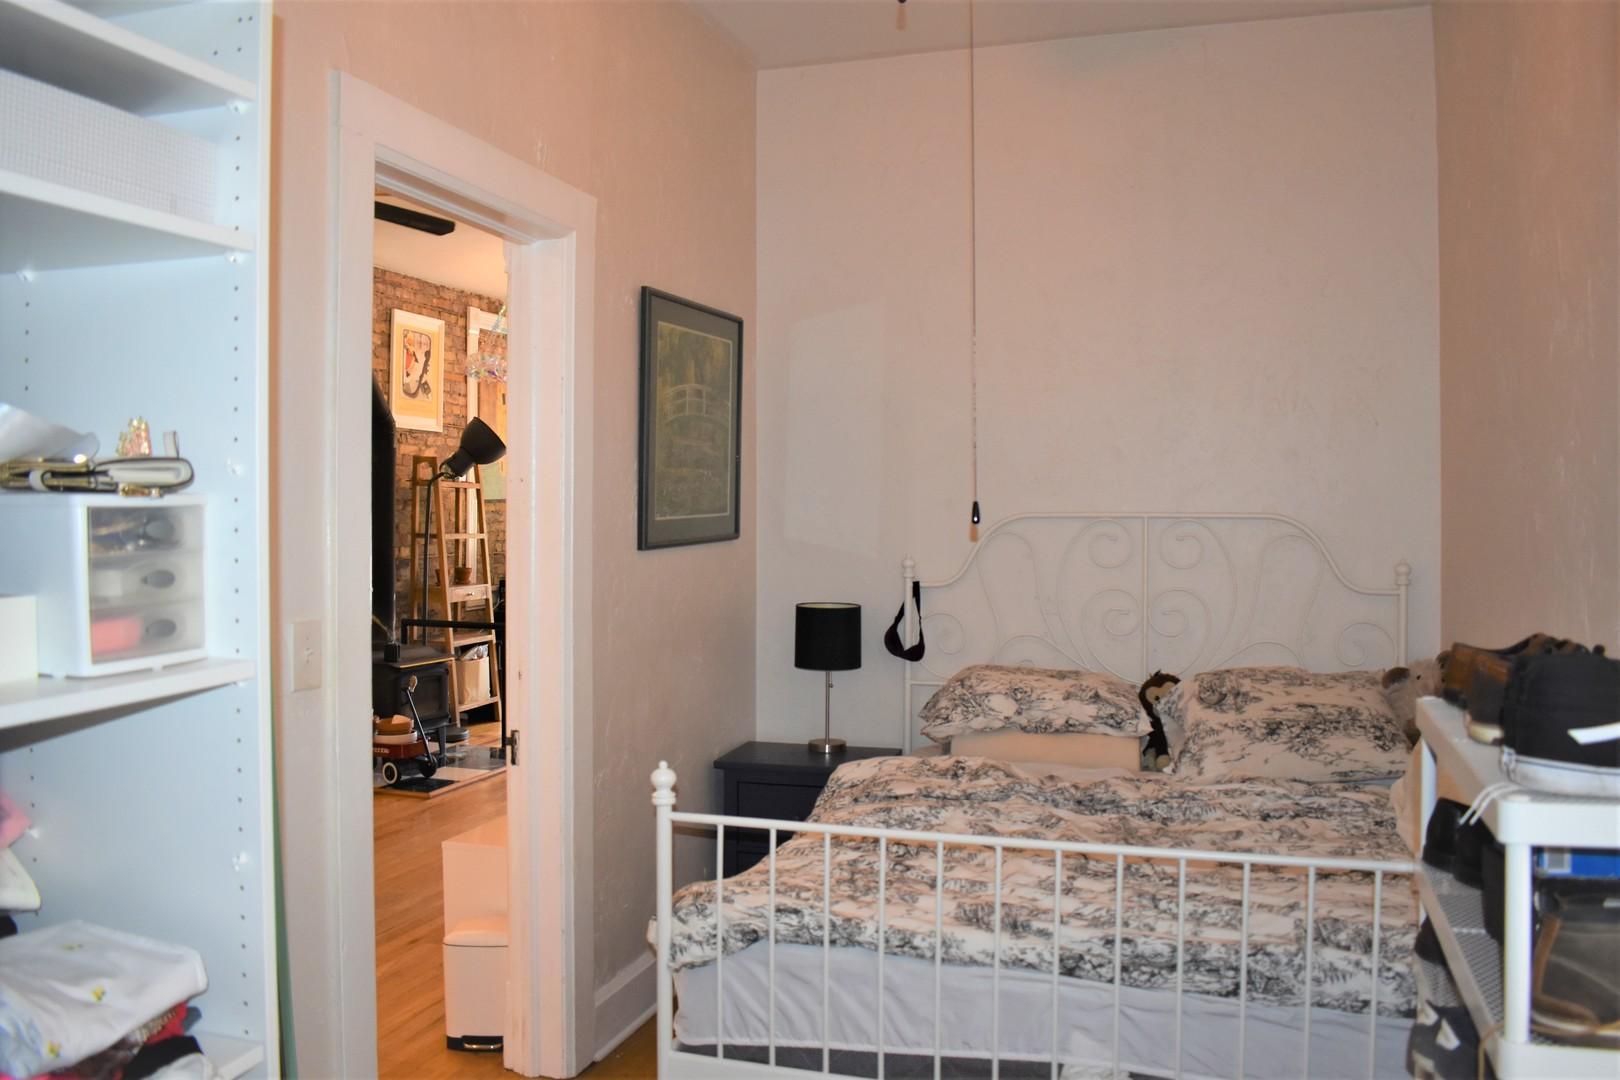 821 N Damen  Avenue, Unit 2 photo